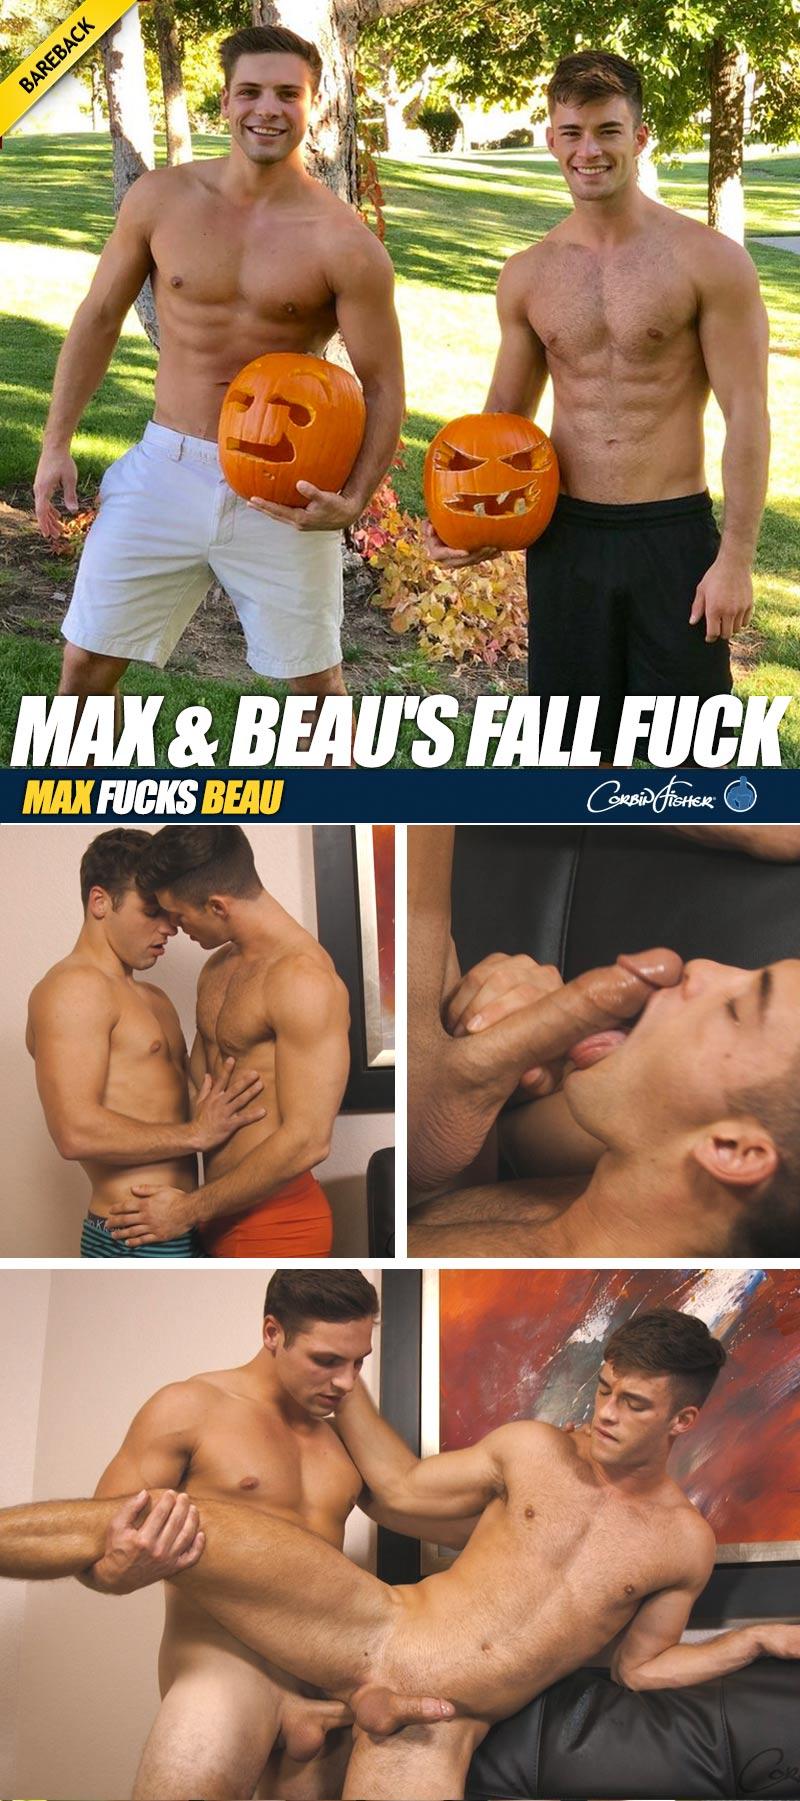 Max & Beau's Fall Fuck (Bareback) at CorbinFisher